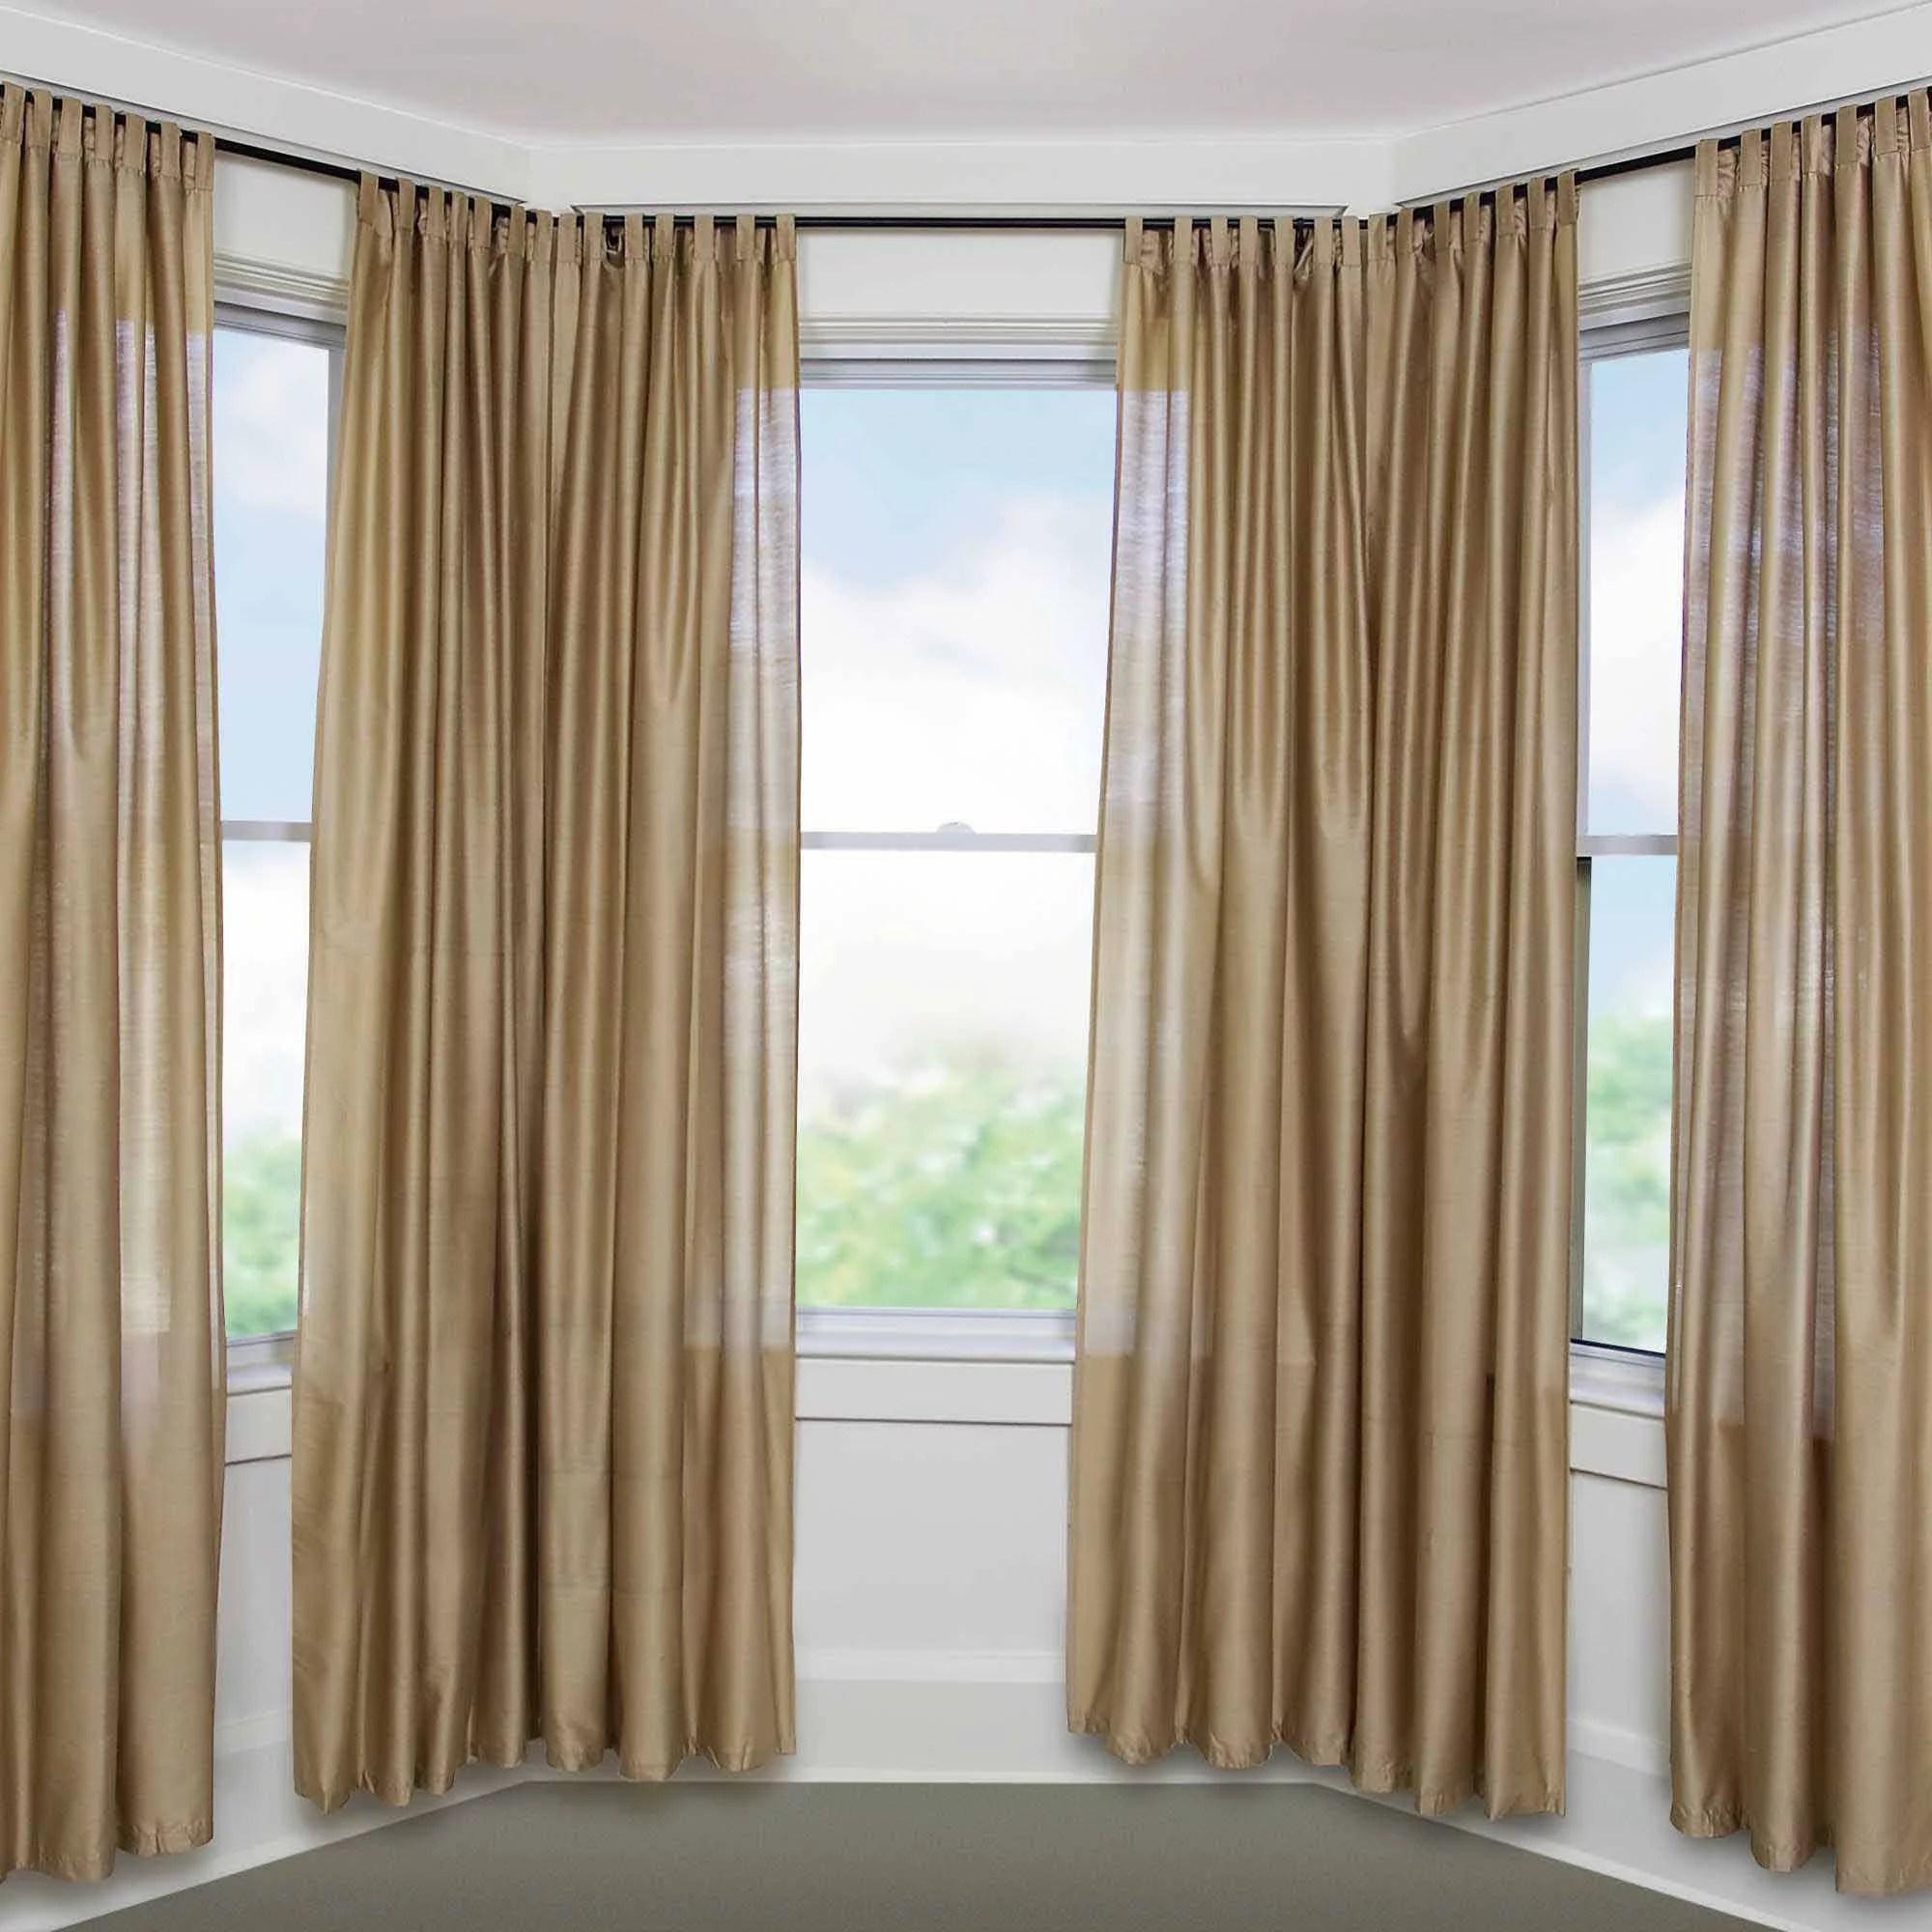 Bay Window Adjustable Curtain Rod For Windows 5 8 Diameter Walmart Com Walmart Com